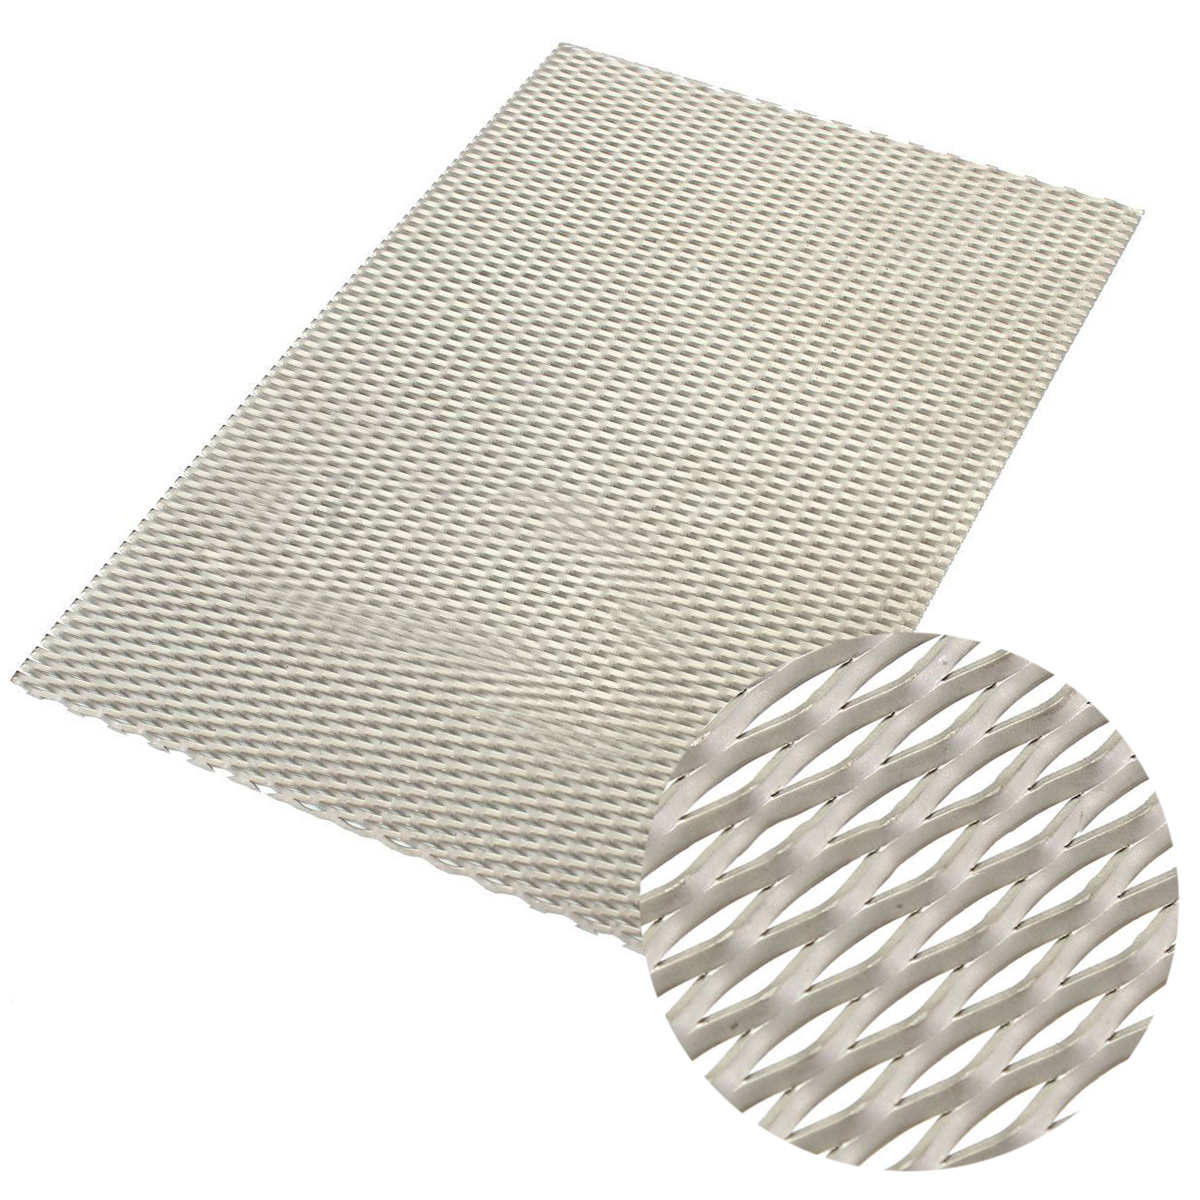 1pcs 200mm*300mm*0.5mm New Metal Titanium Mesh Sheet Perforated Plate Expanded1pcs 200mm*300mm*0.5mm New Metal Titanium Mesh Sheet Perforated Plate Expanded